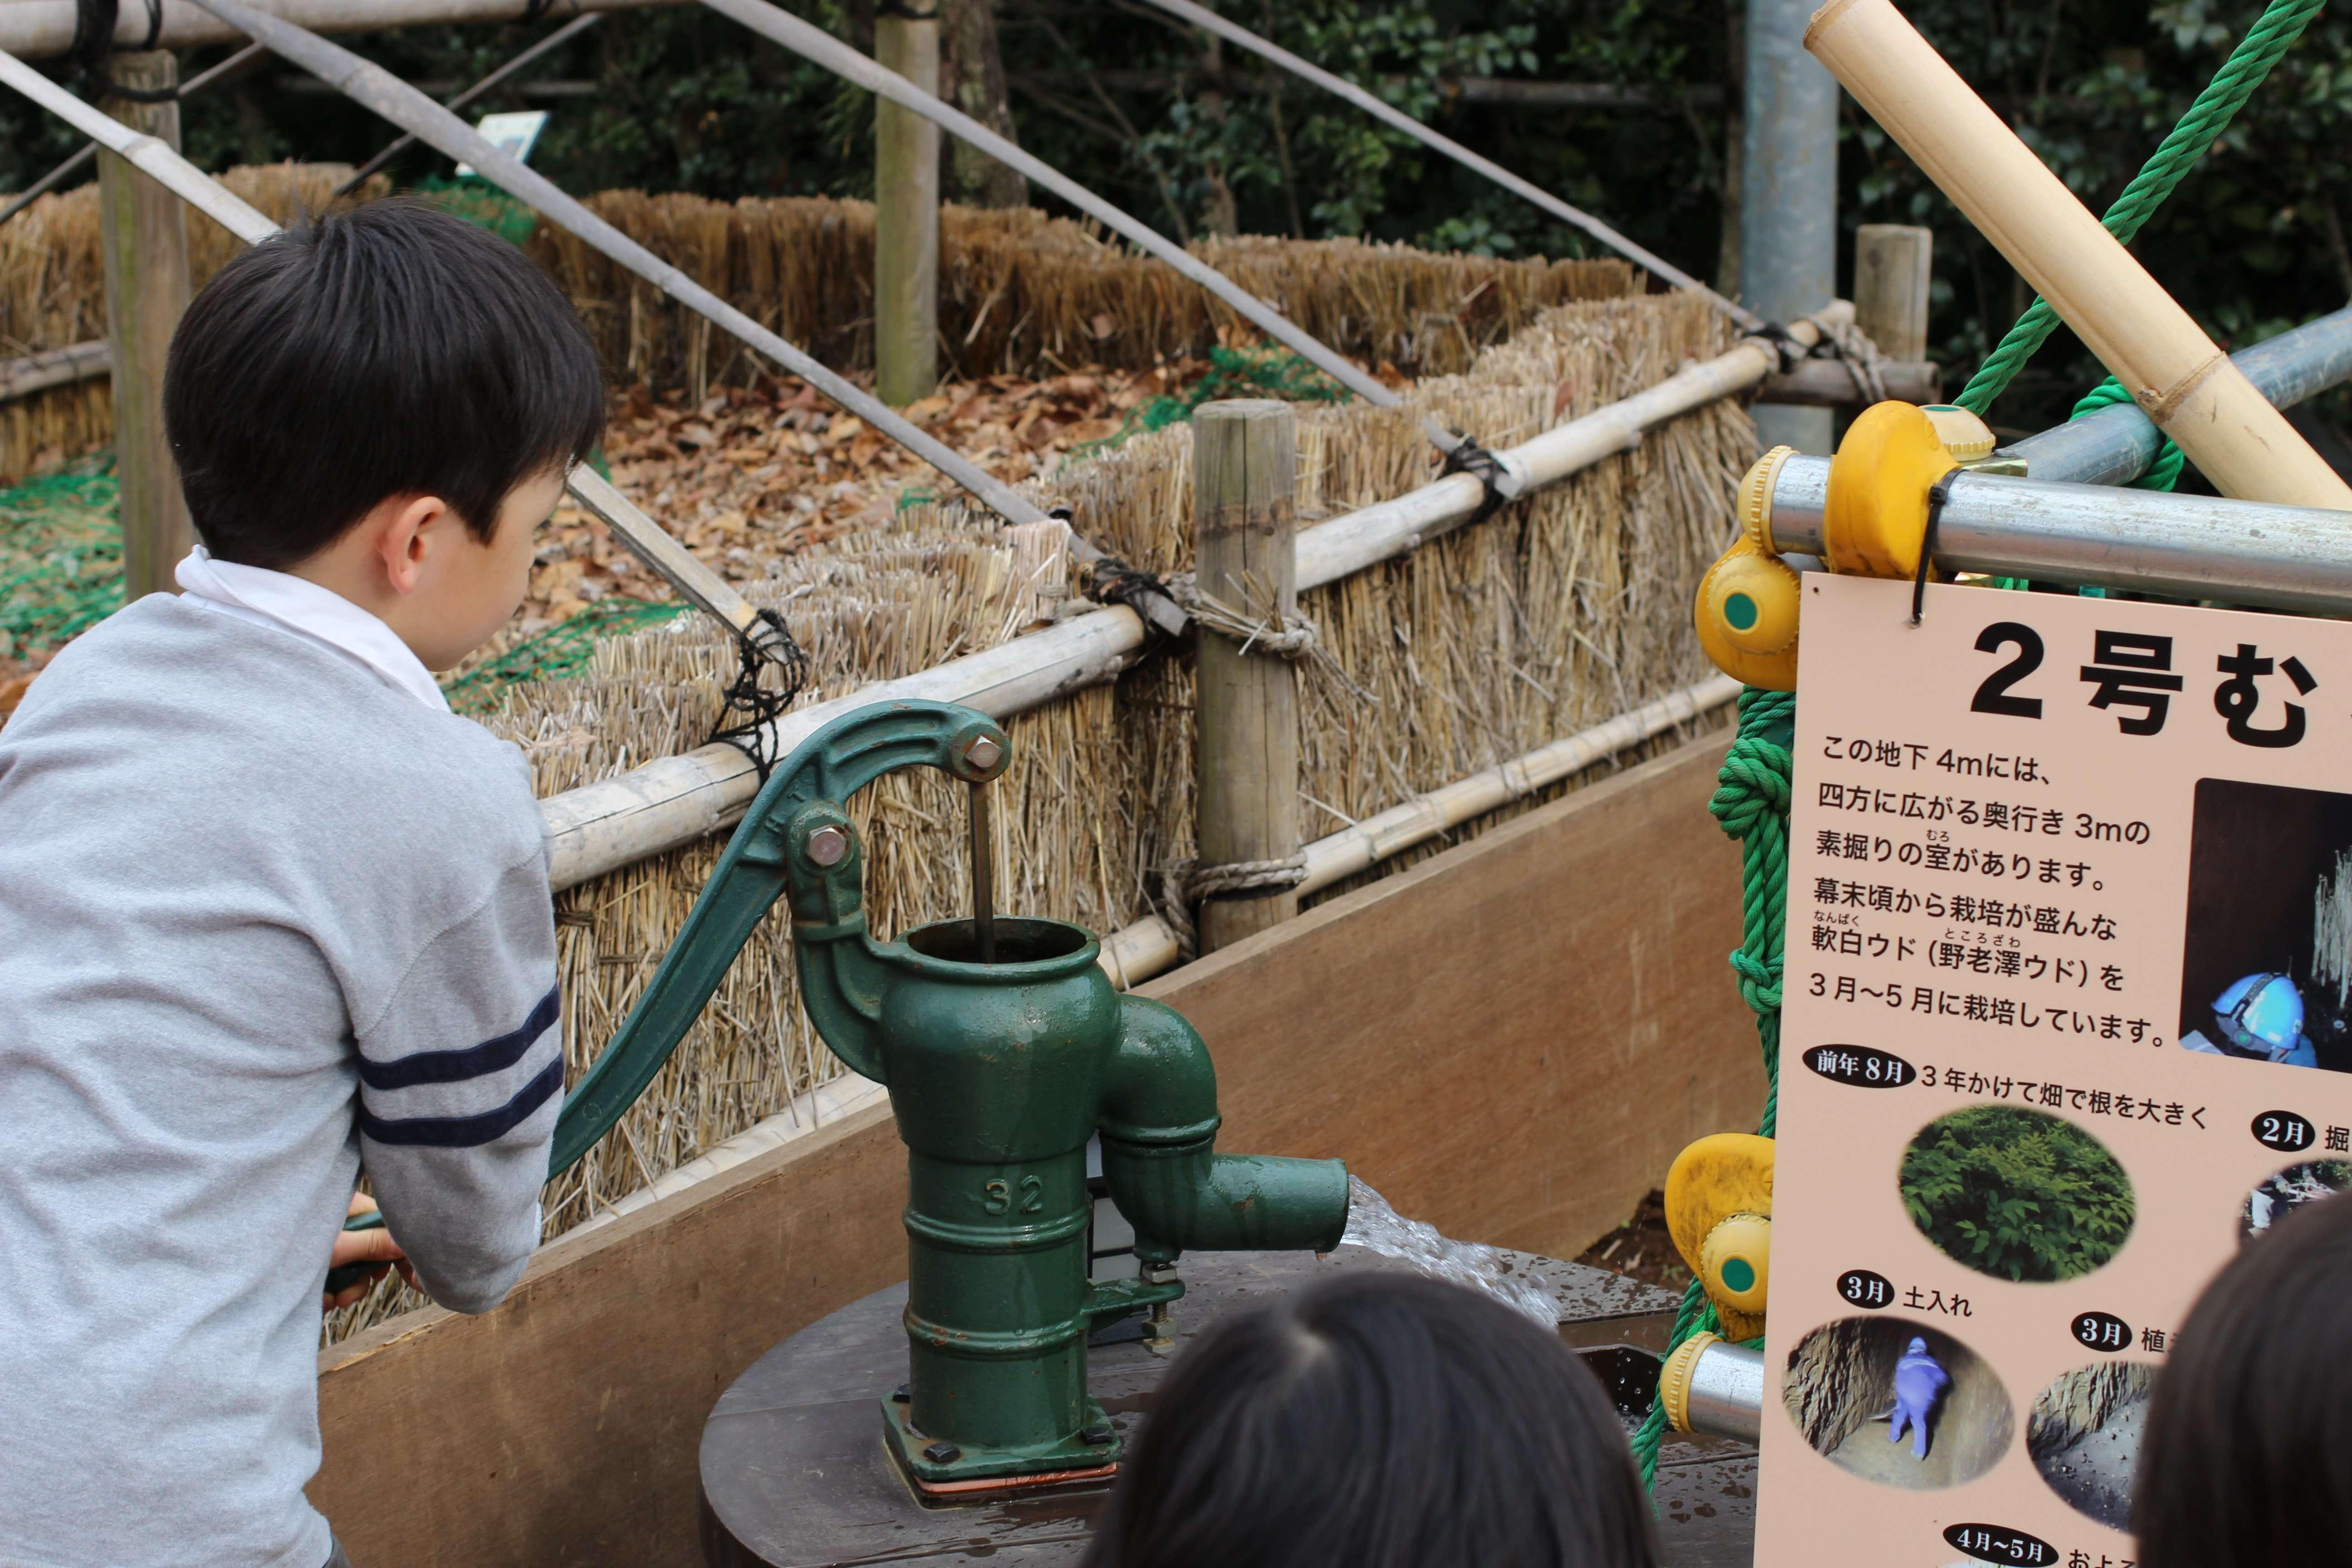 Pumping water at storyteller museum